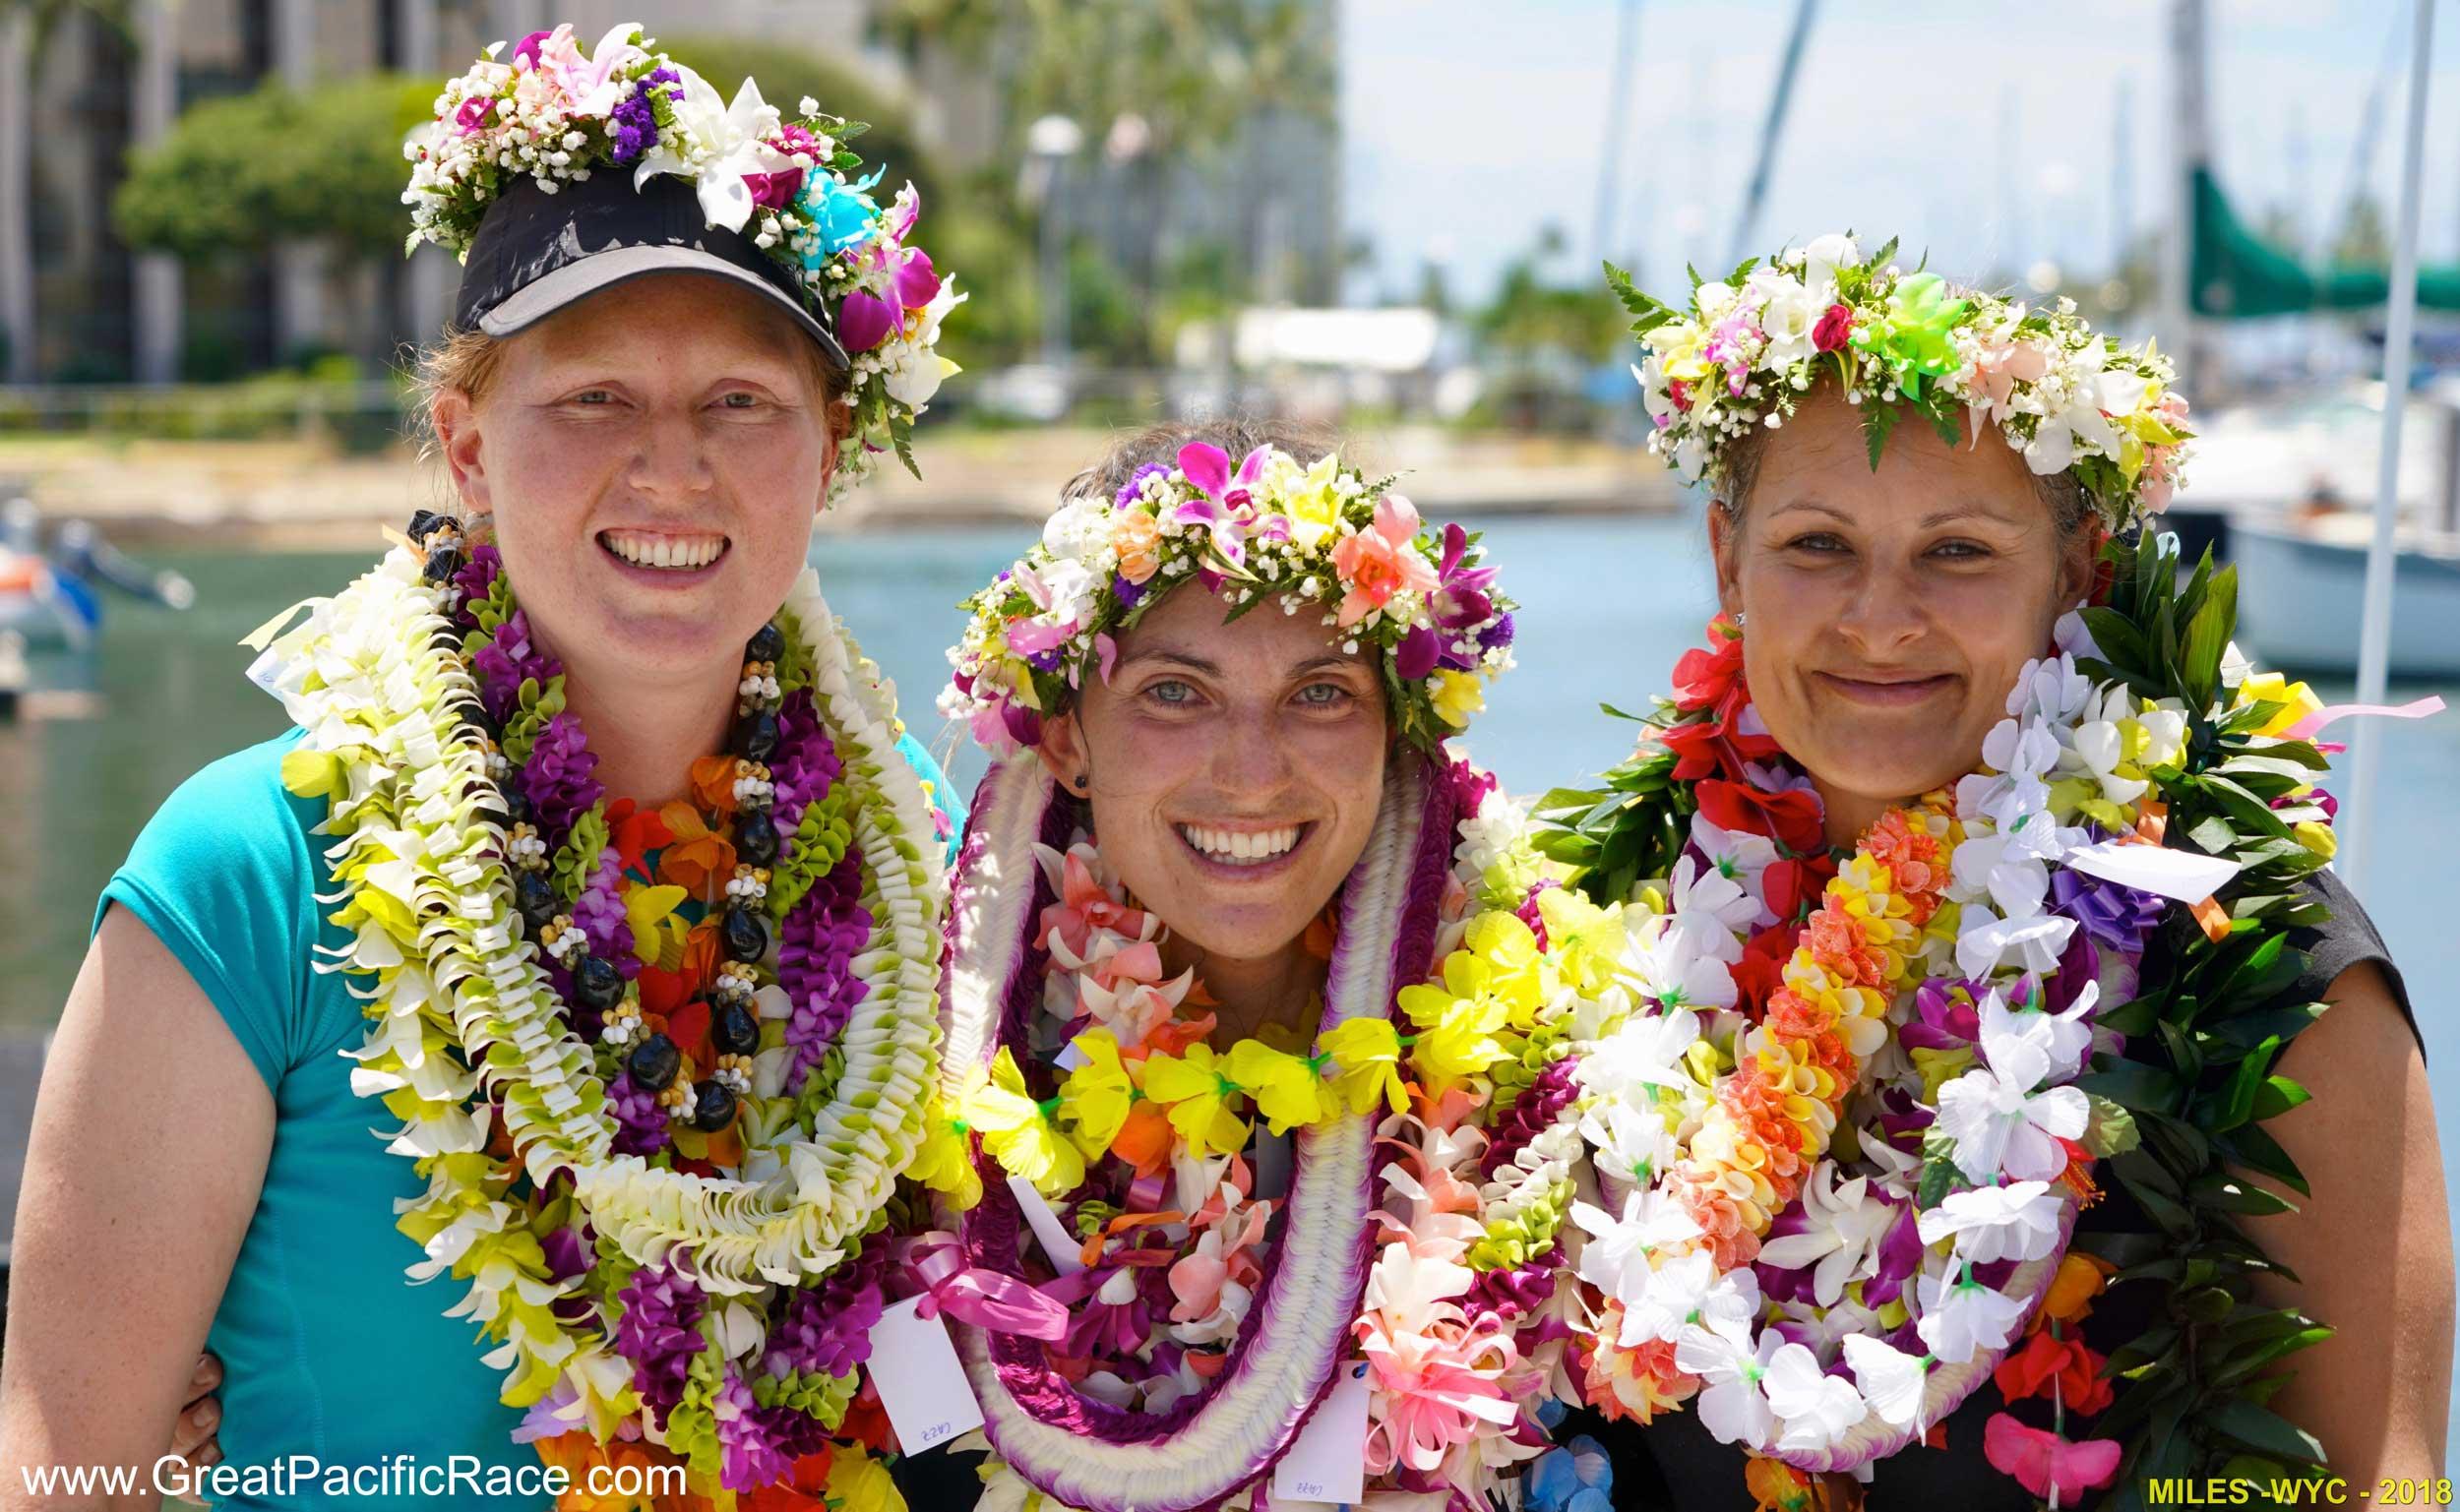 The Pacific Terrific Crew - Eleanor Carey (L), Cazz Lander (Center), Megan Hoskin (R)